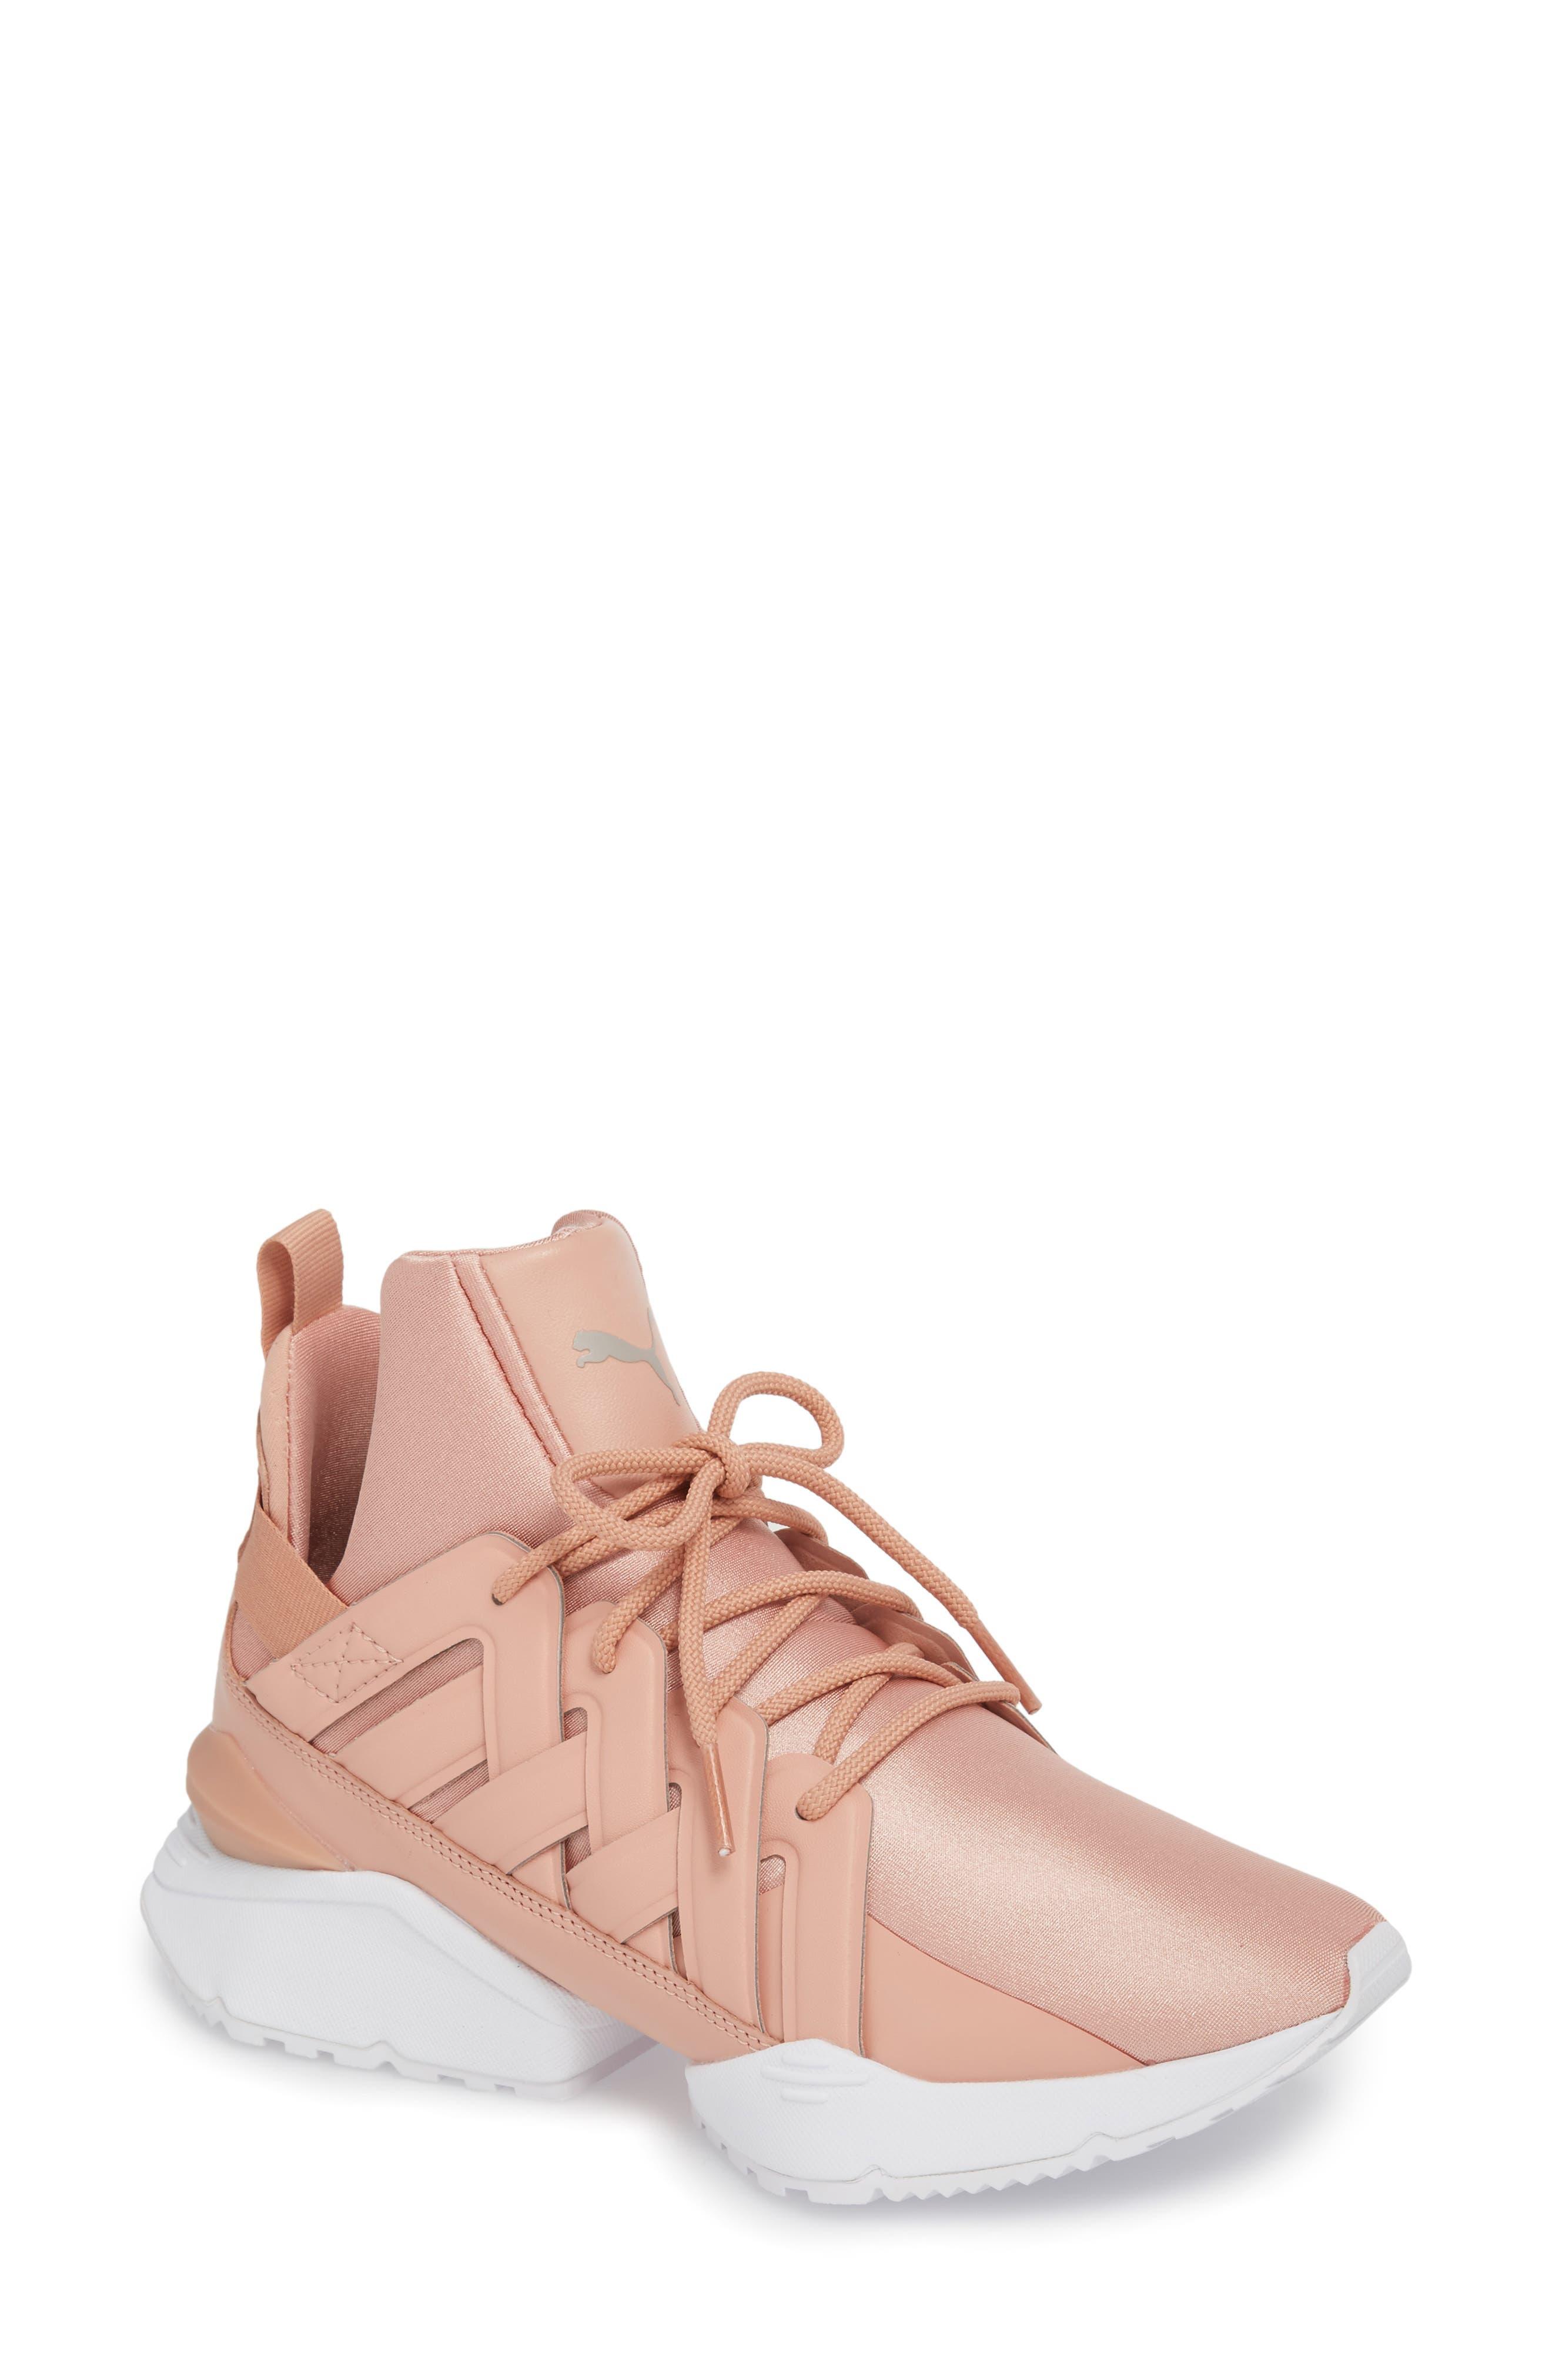 PUMA Muse Echo Satin En Pointe High Top Sneaker (Women)